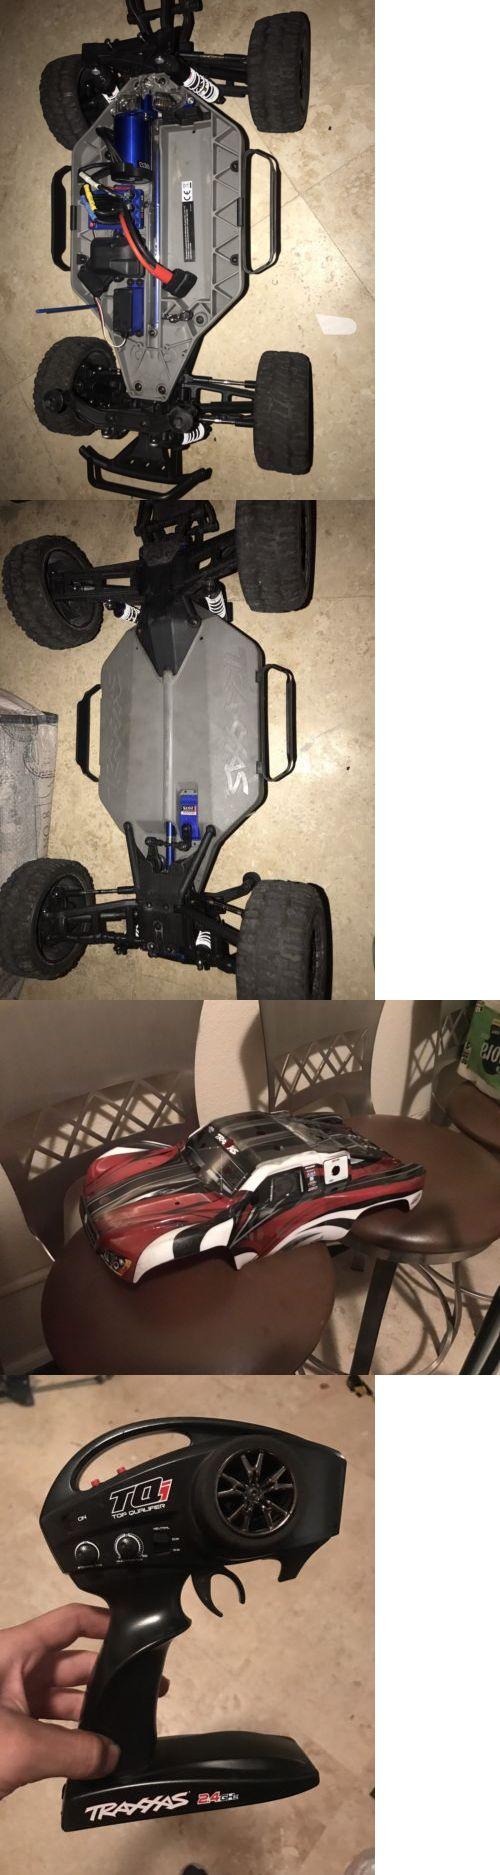 Cars Trucks and Motorcycles 182183 Traxxas Slash 4X4